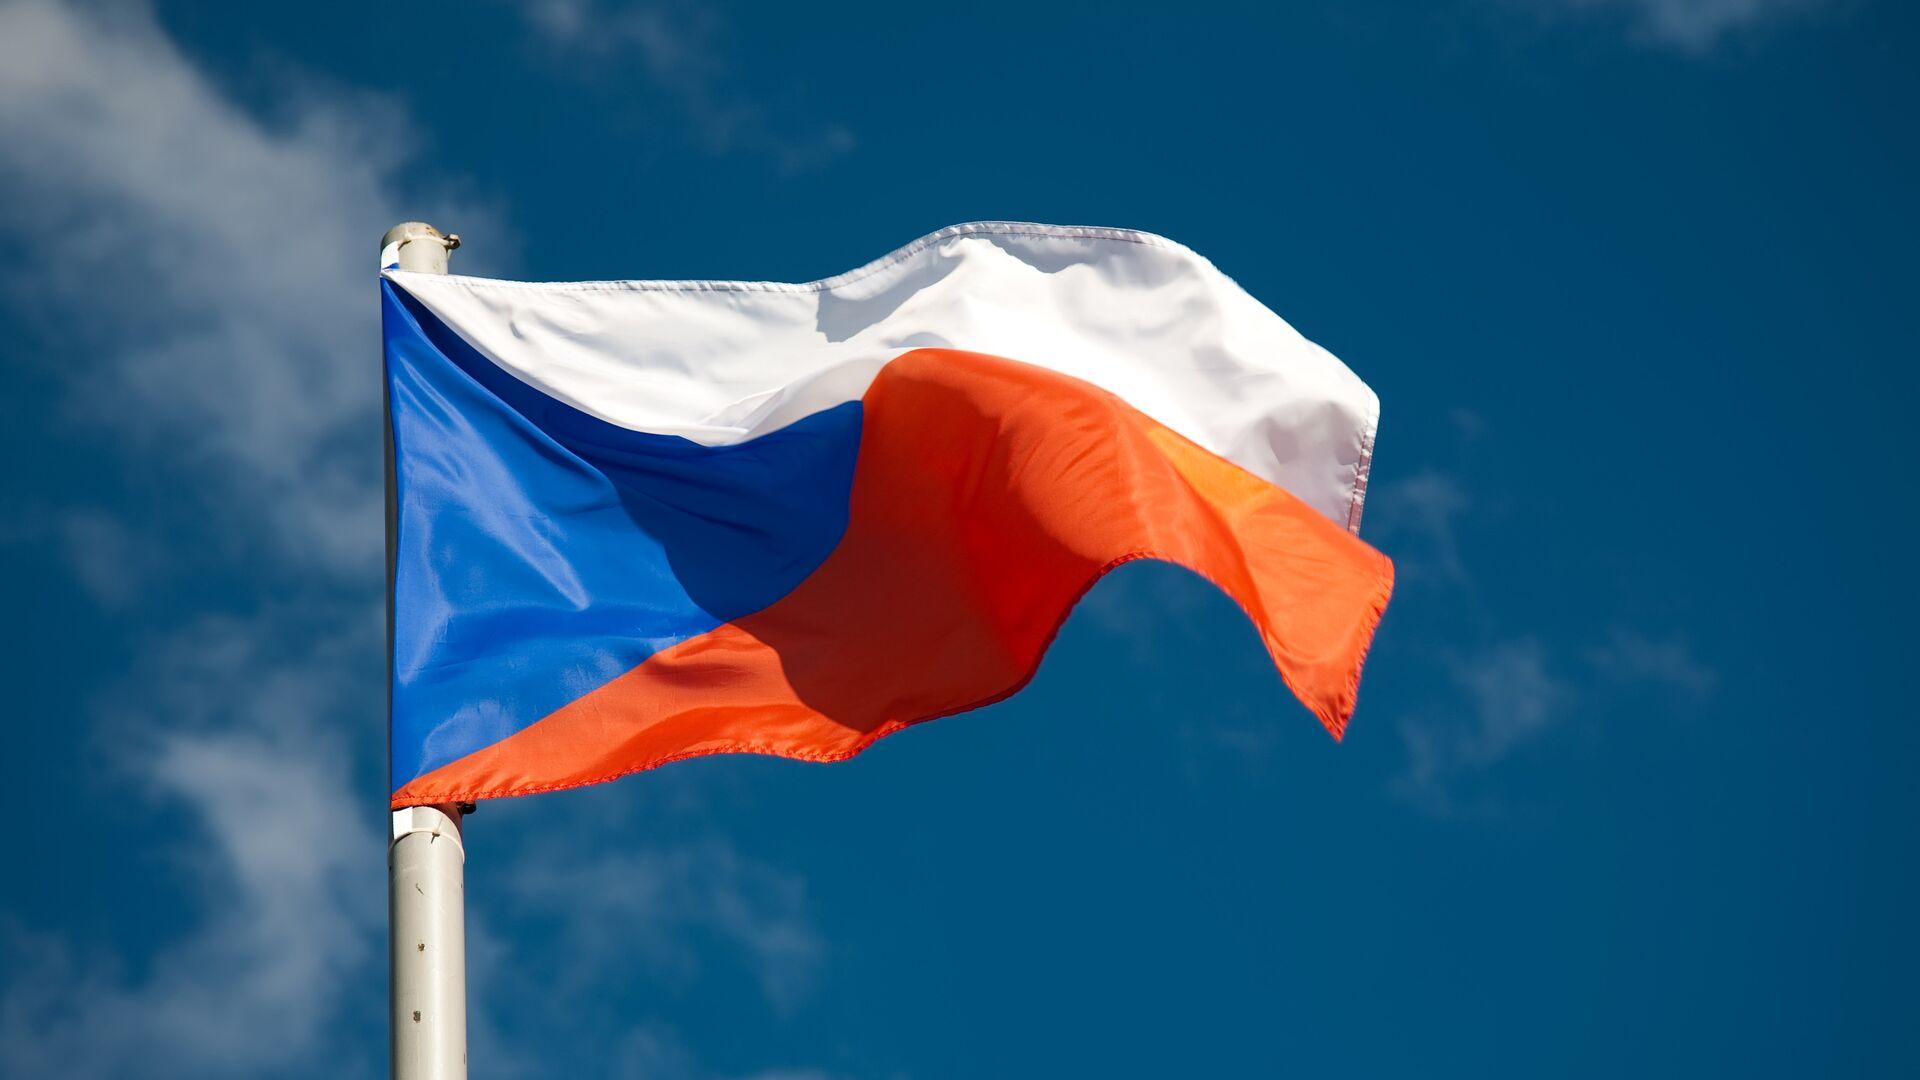 Флаг Чехии. Архивное фото - РИА Новости, 1920, 15.04.2021